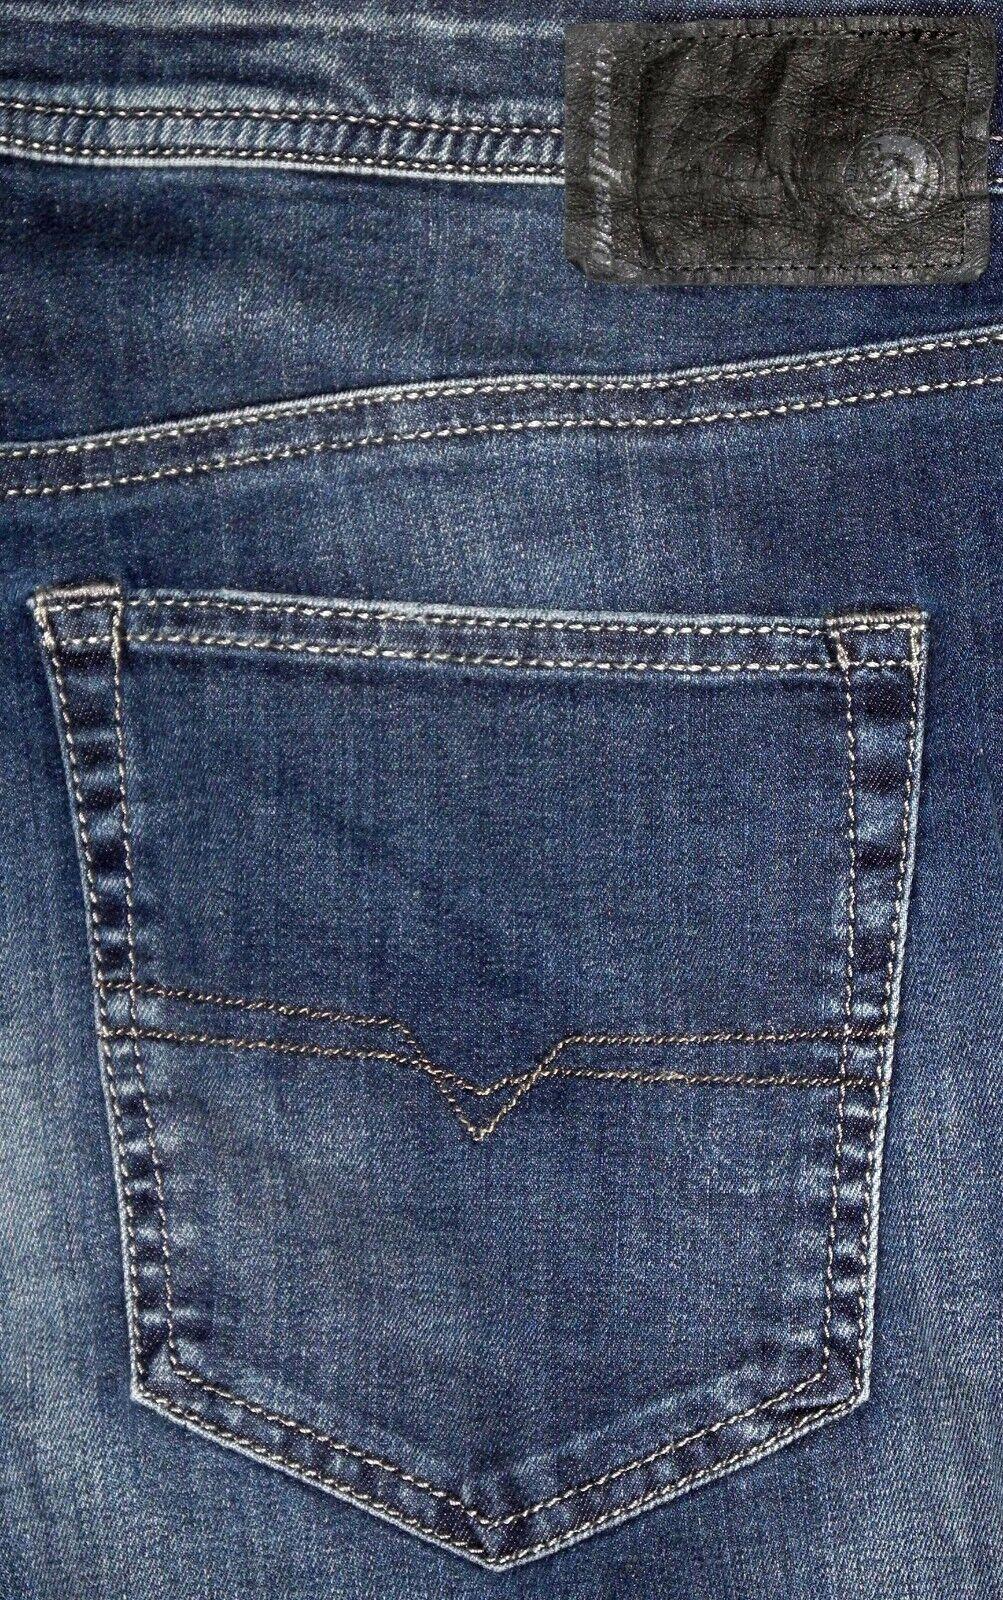 NEW Diesel Buster Regular Fit Tapered Leg Men's bluee Jeans Sz. 40x32